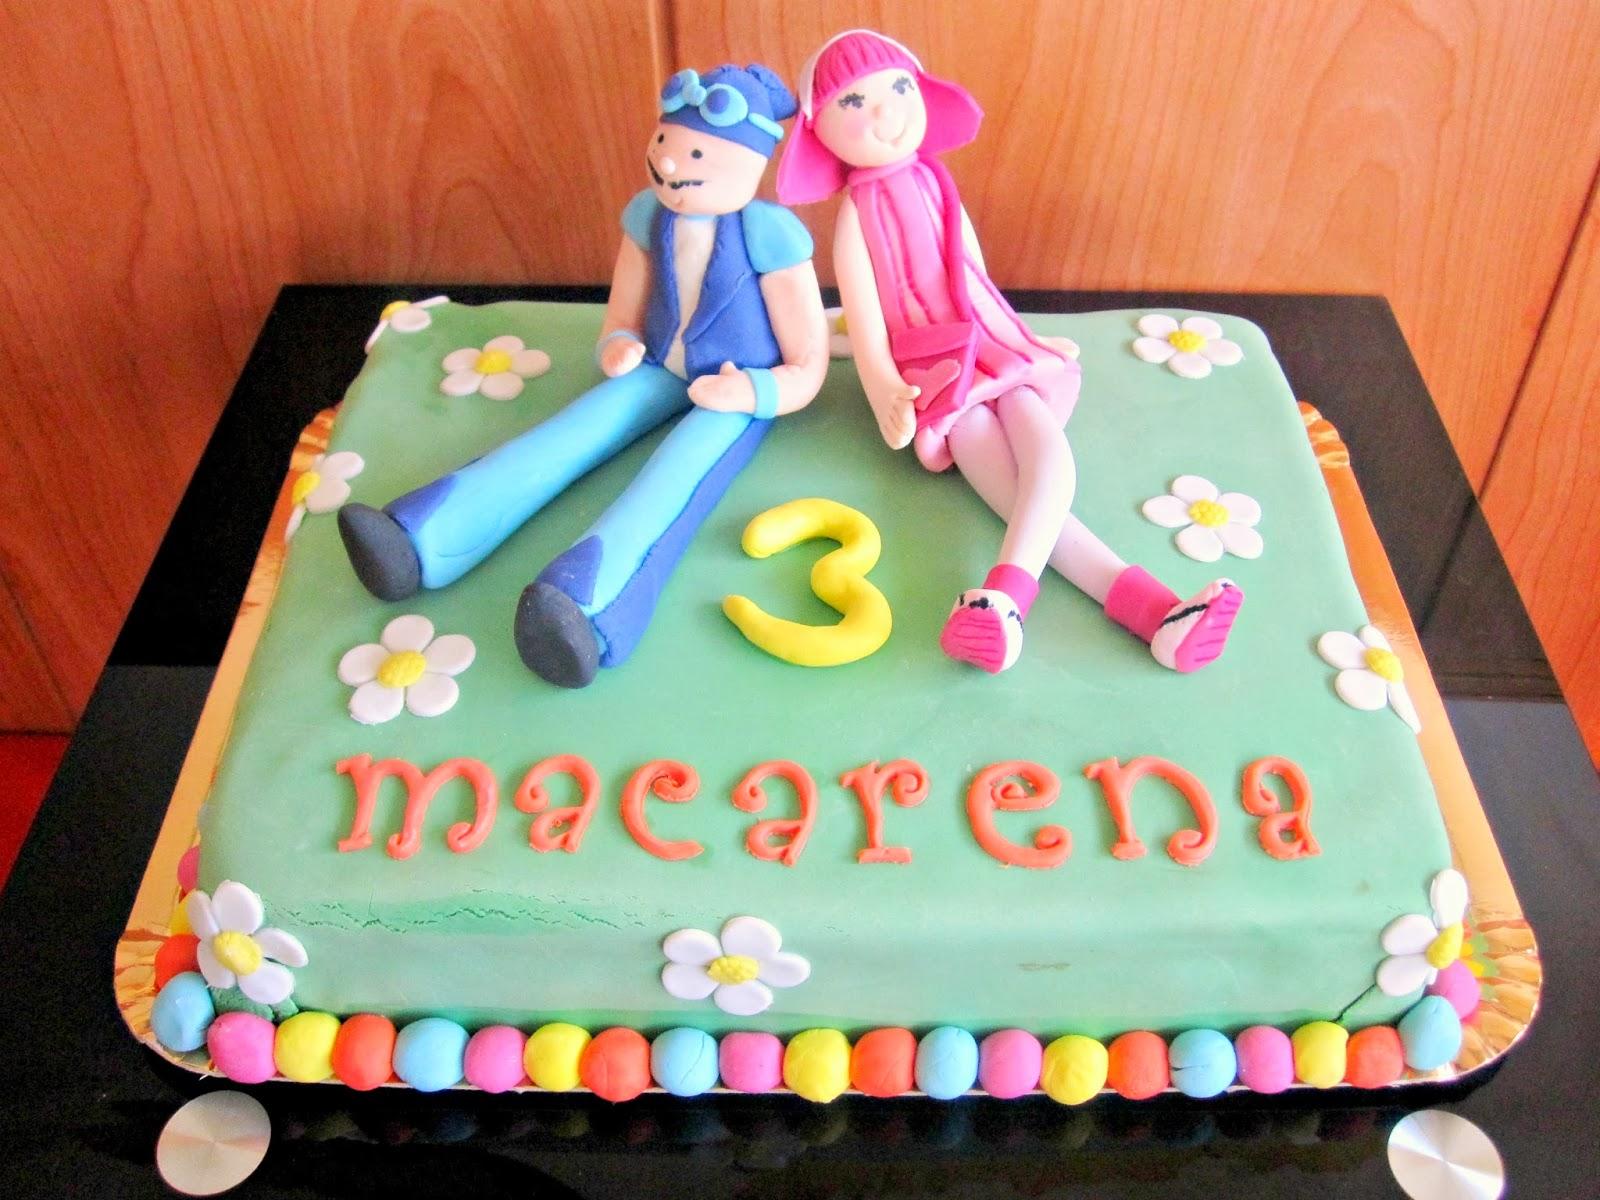 http://www.experimentando-enla-cocina.blogspot.com.es/2013/11/tarta-lazy-town-y-detalles-que-hacen.html